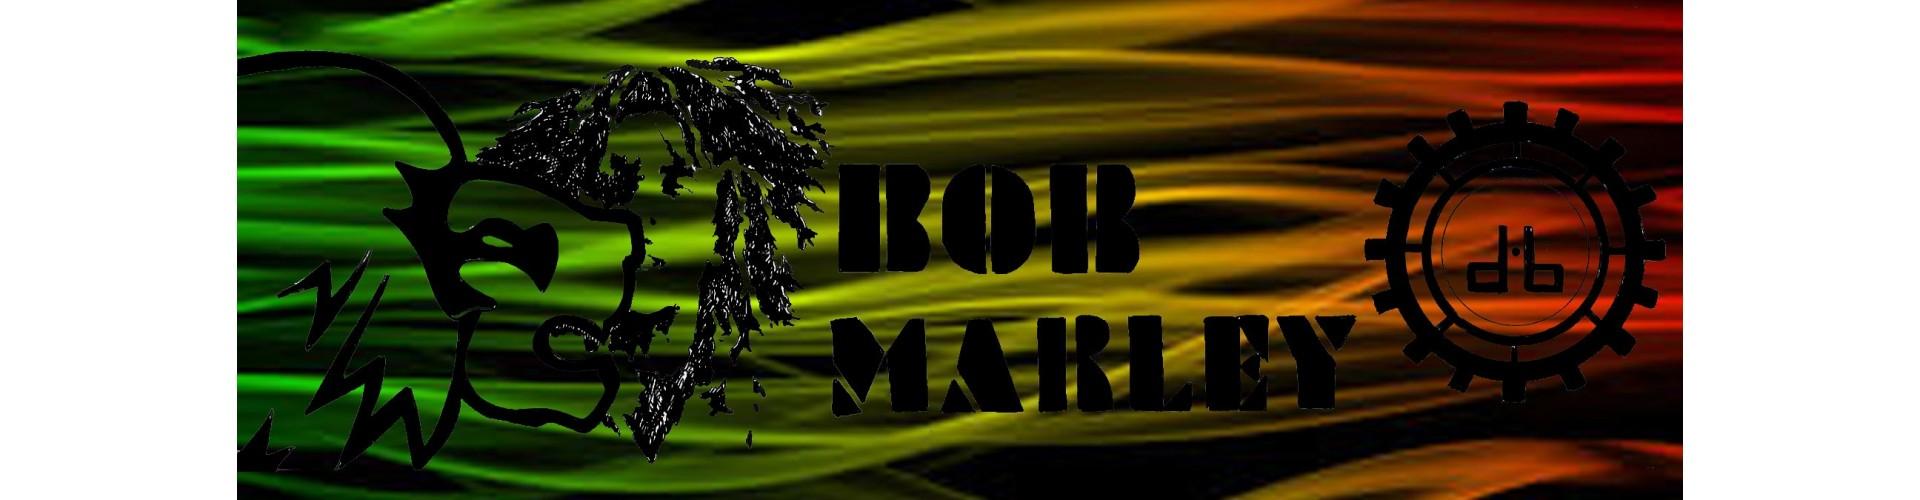 Sweat Bob Marley Homme pour les fans du reggae, sweat bob marley